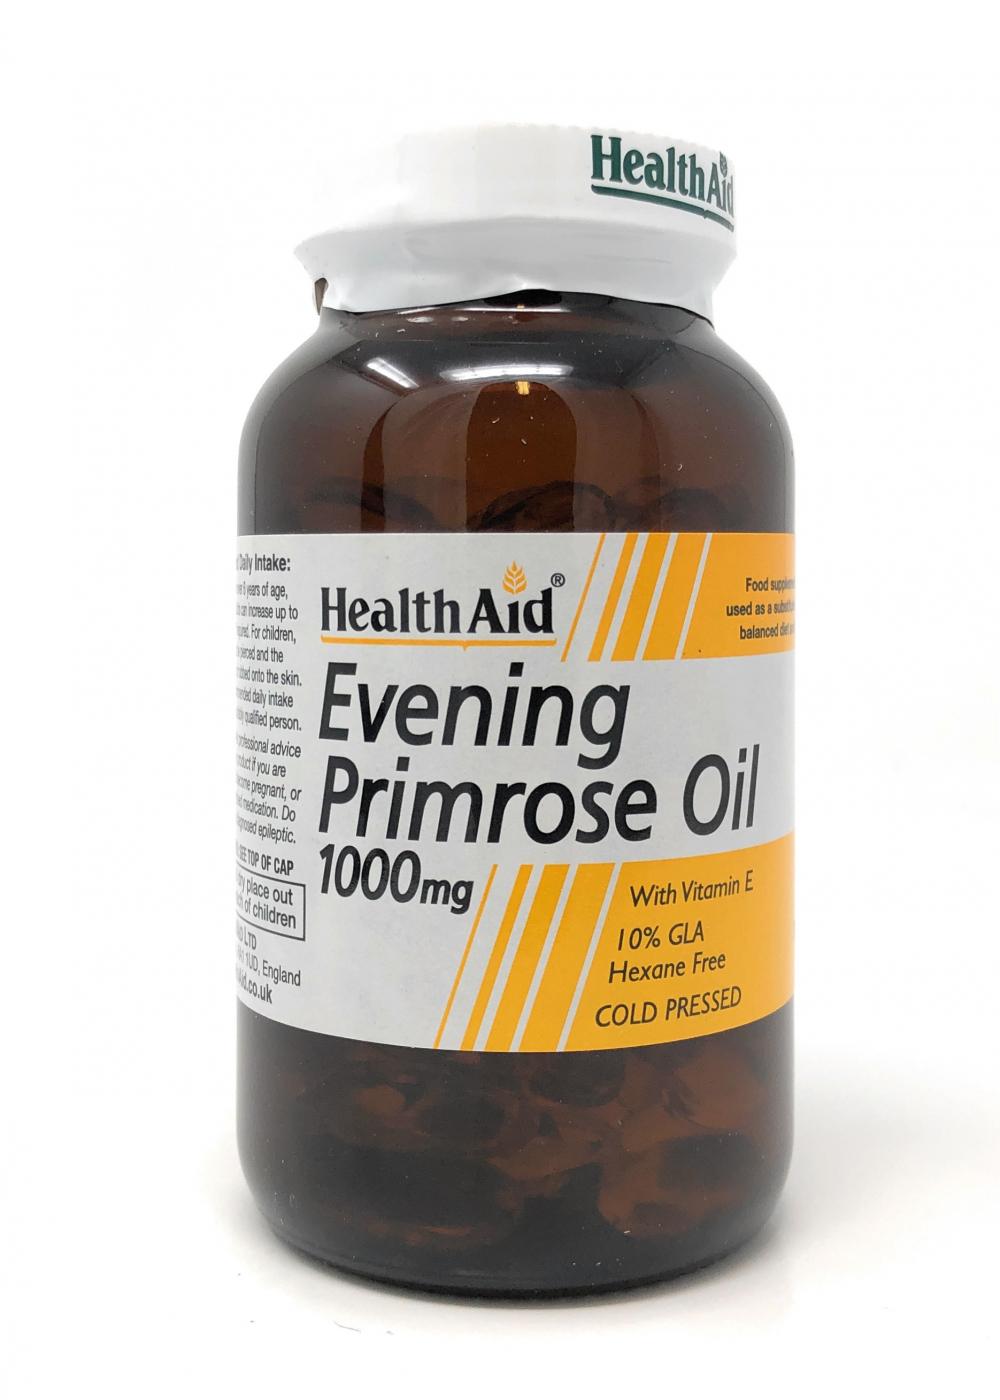 HealthAid Evening Primrose Oil 1000mg (Nachtkerzenöl) + Vitamin E 90 Weichgelatine-Kapseln